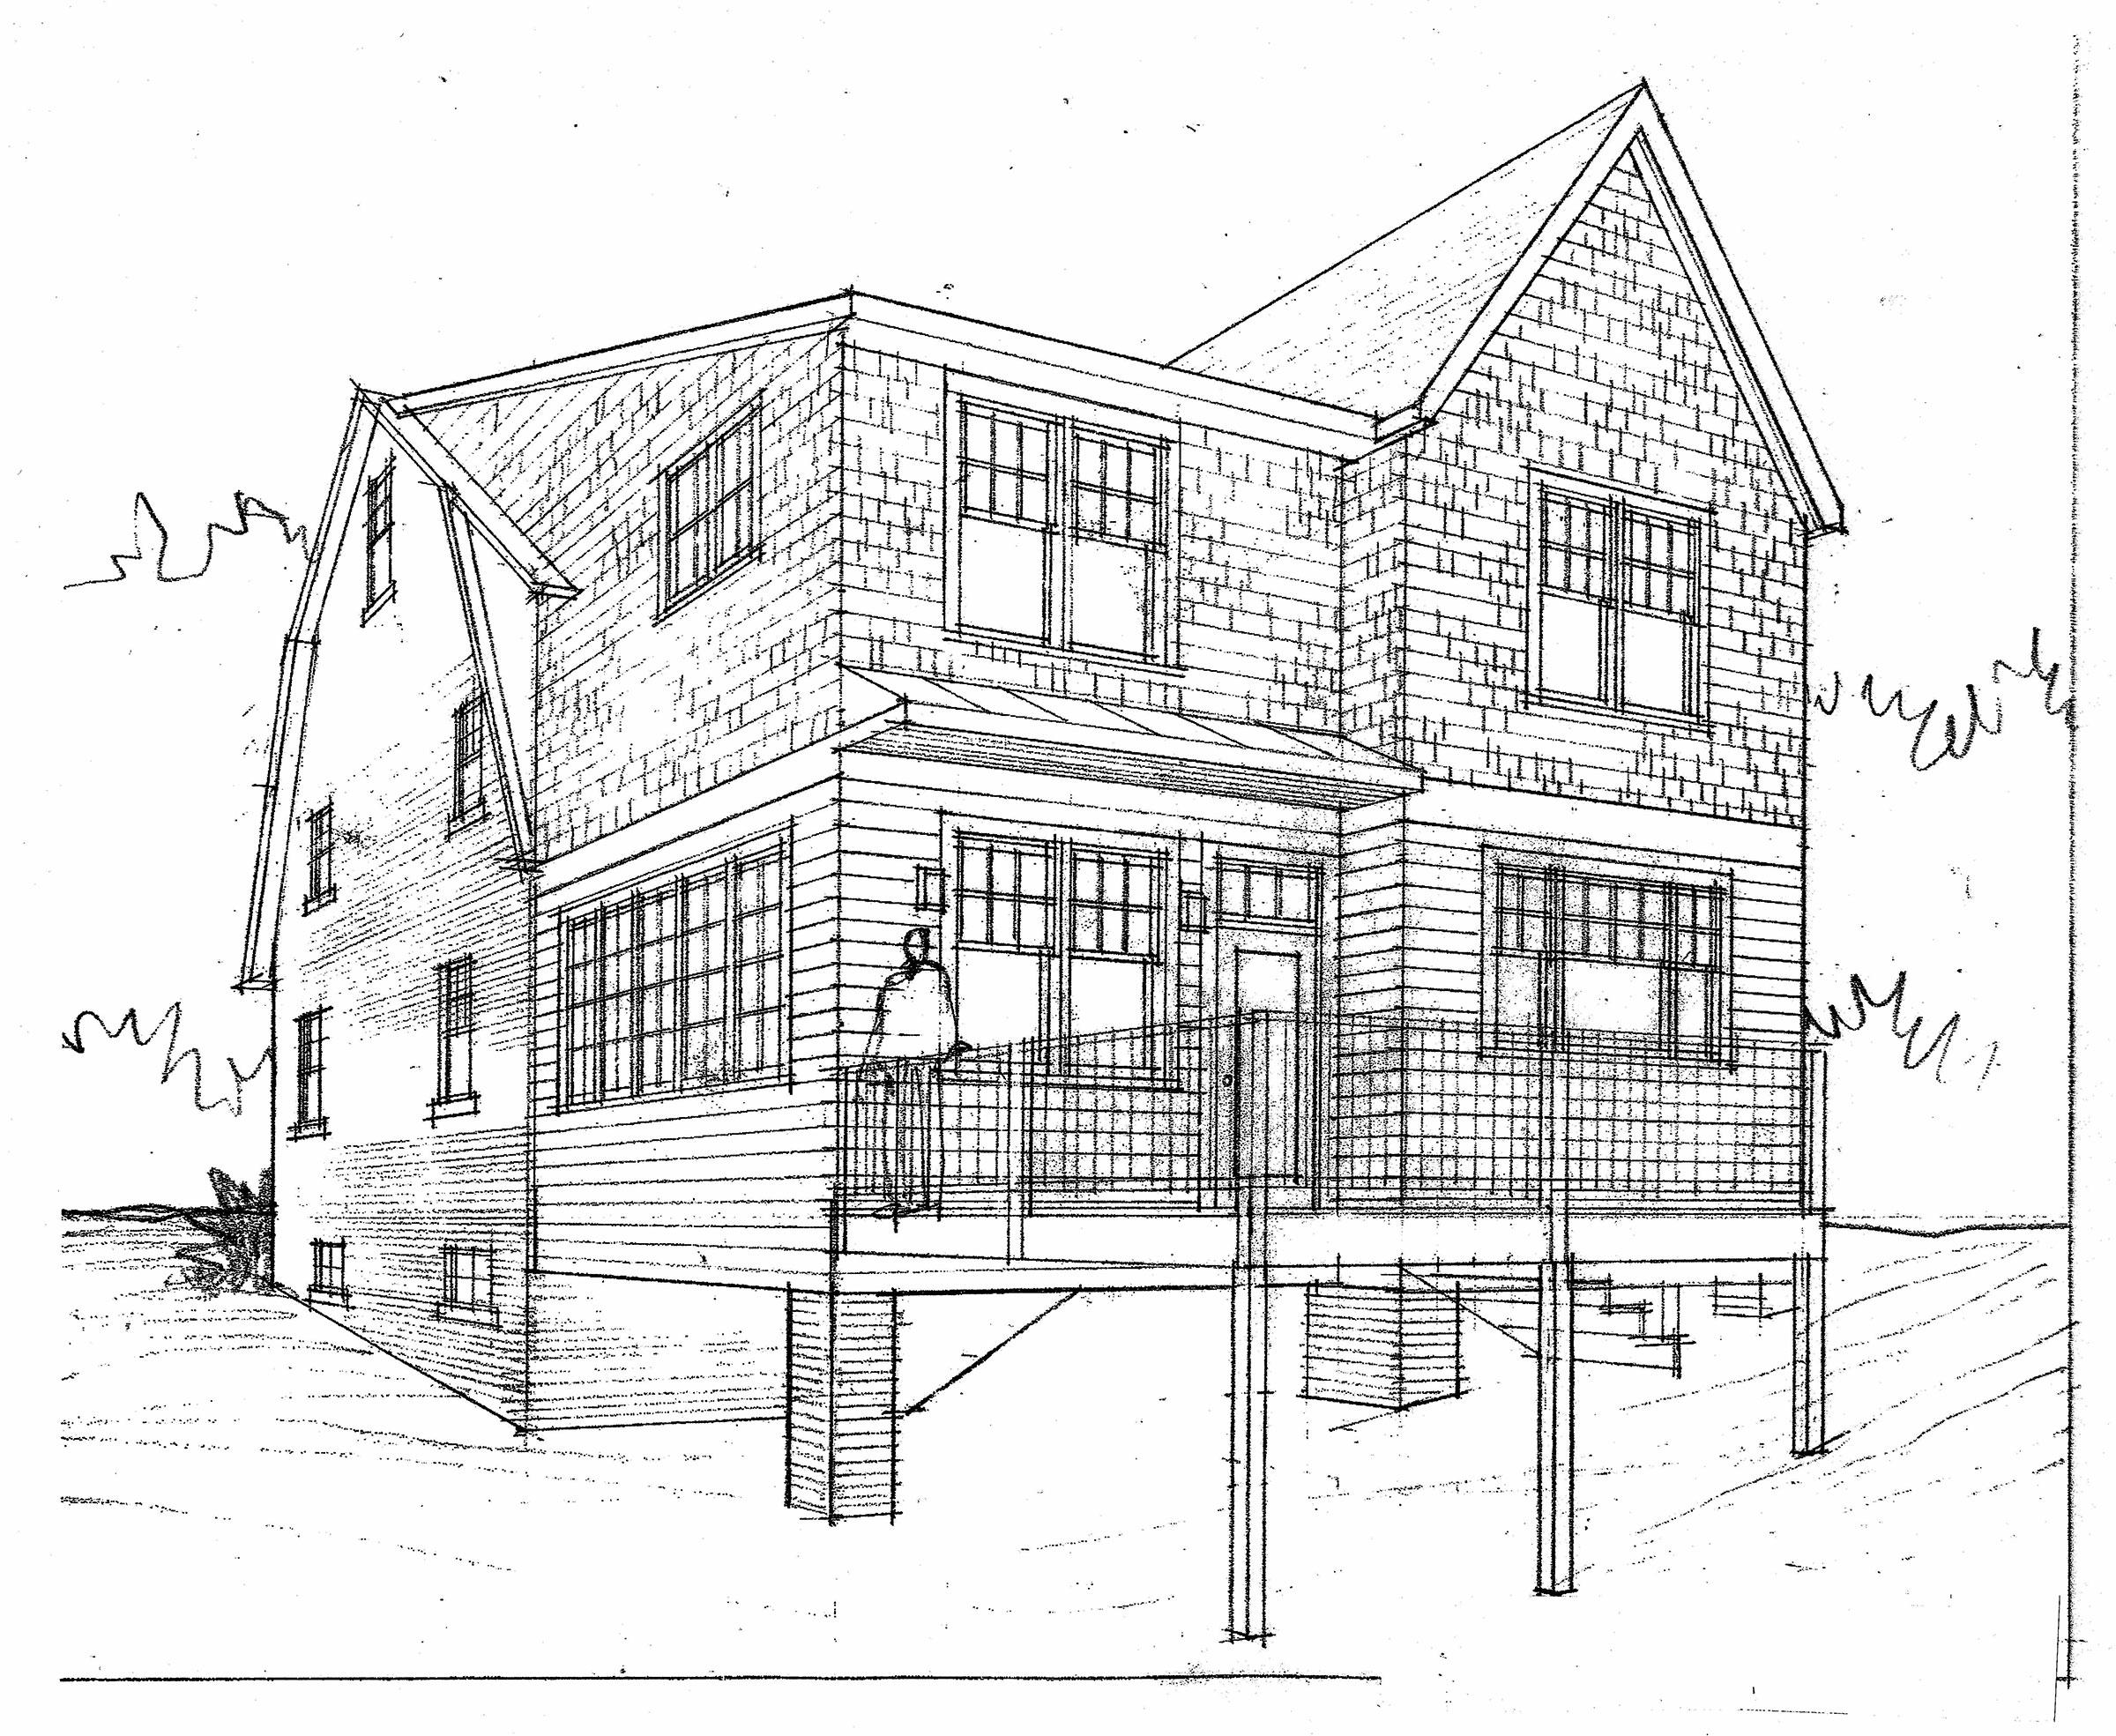 1-Sketch-Exterior-Addition-Design